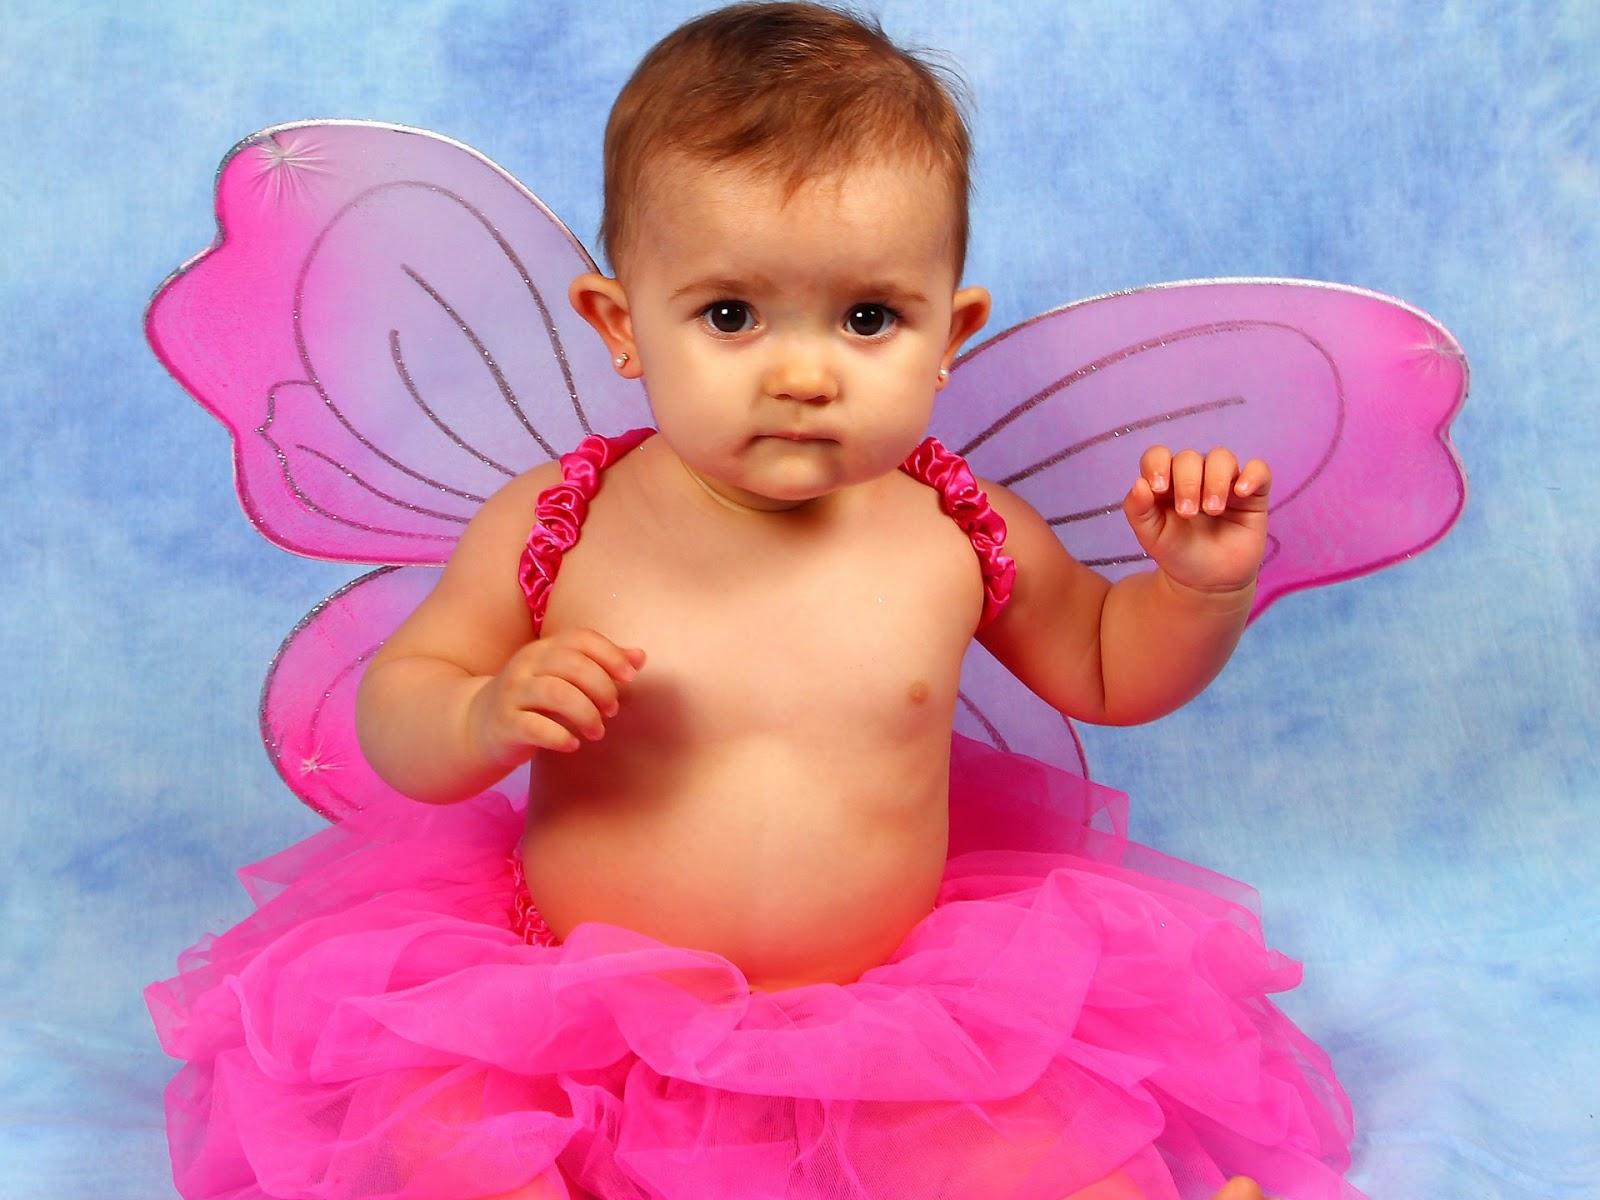 Hd Wallpapers Free Cute Nice Beautiful Angel Sweet Baby High Resolution Hd Wallpapers Desktop Free Download